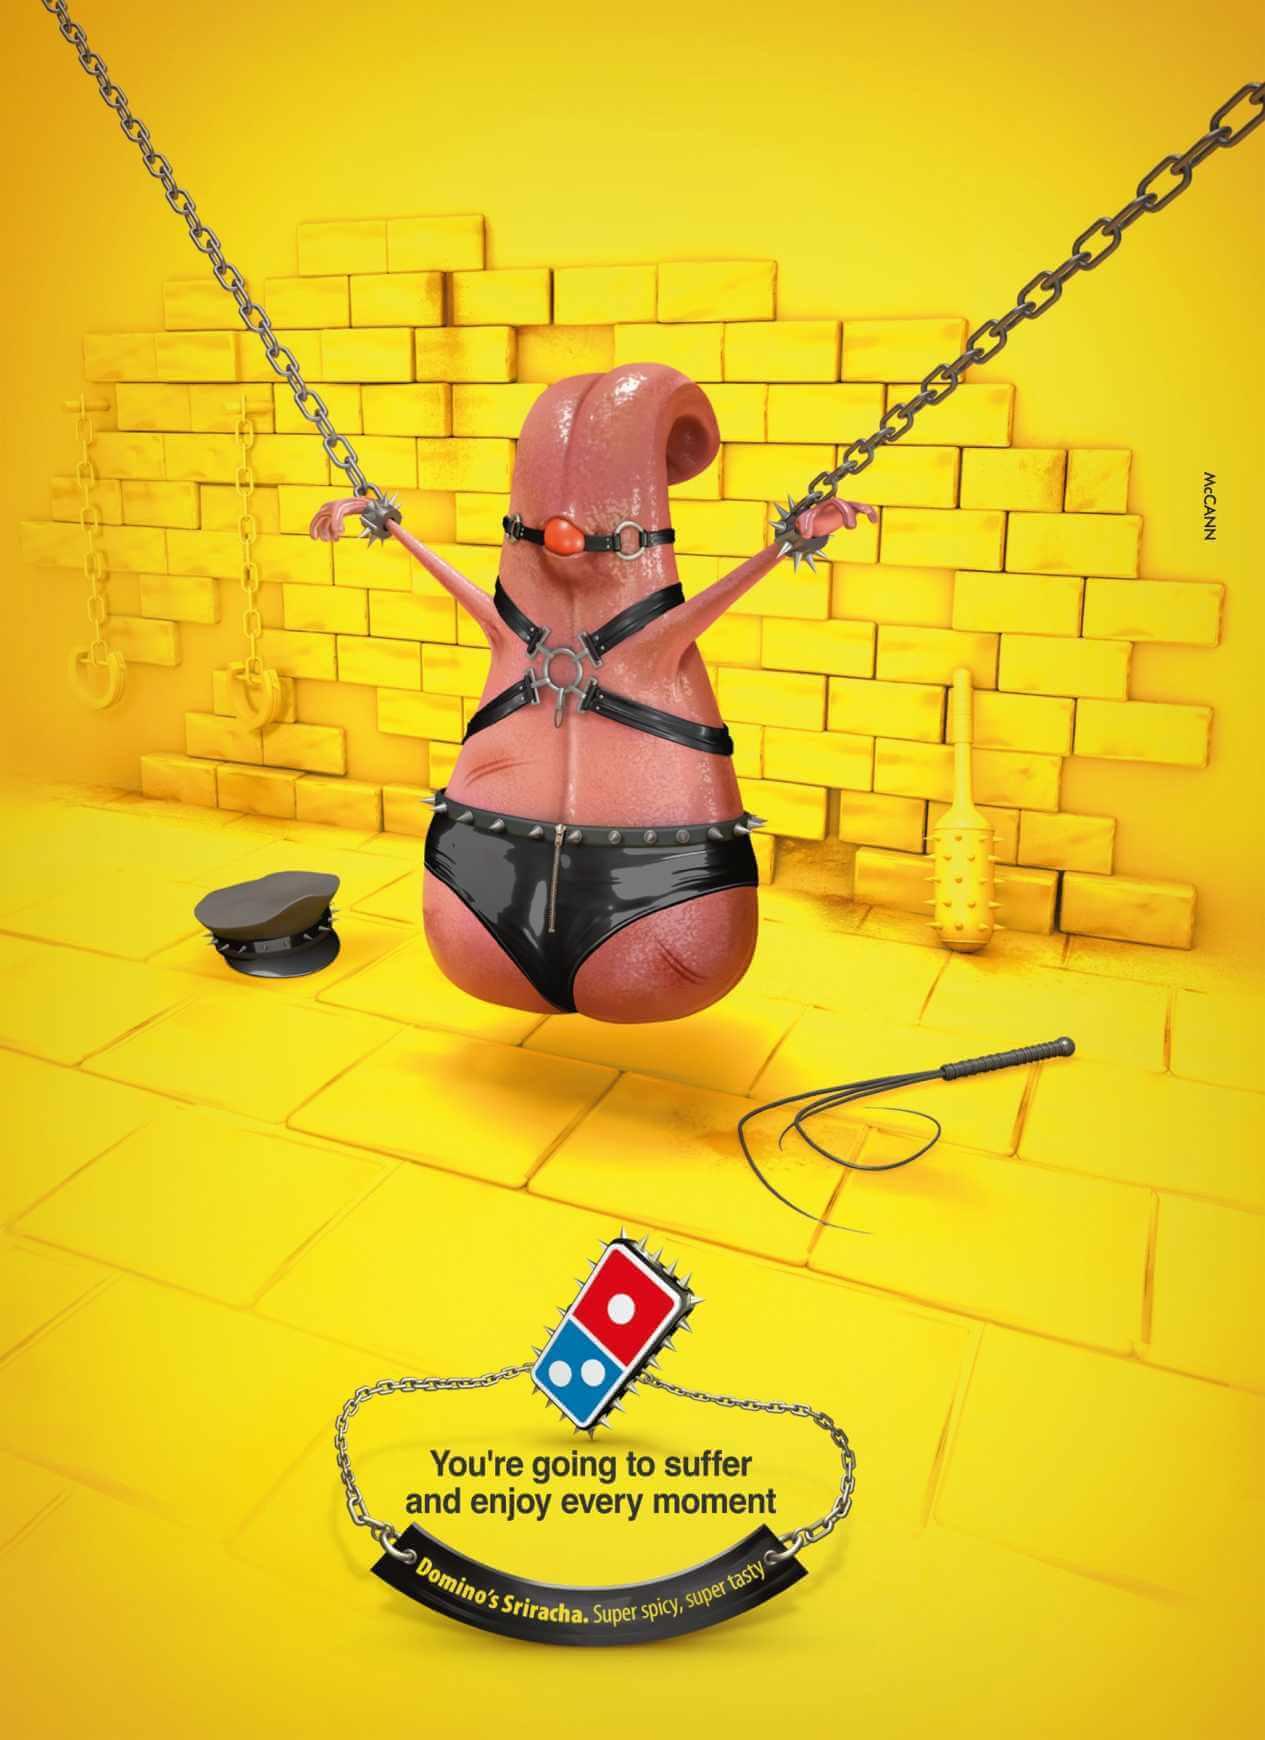 Dominos Pizza: Amor apache.